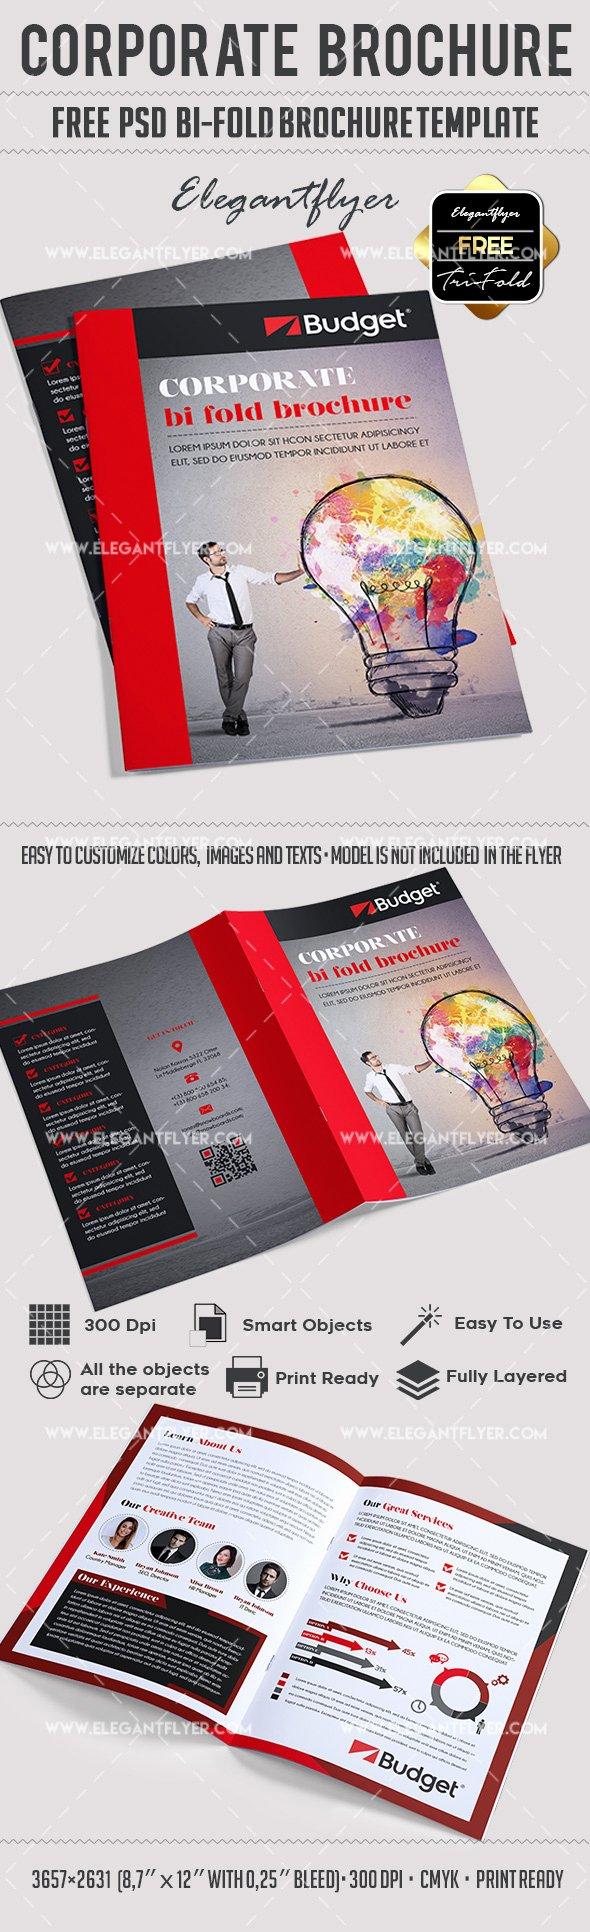 Corporate – Free Psd Bi Fold Psd Brochure Template – by